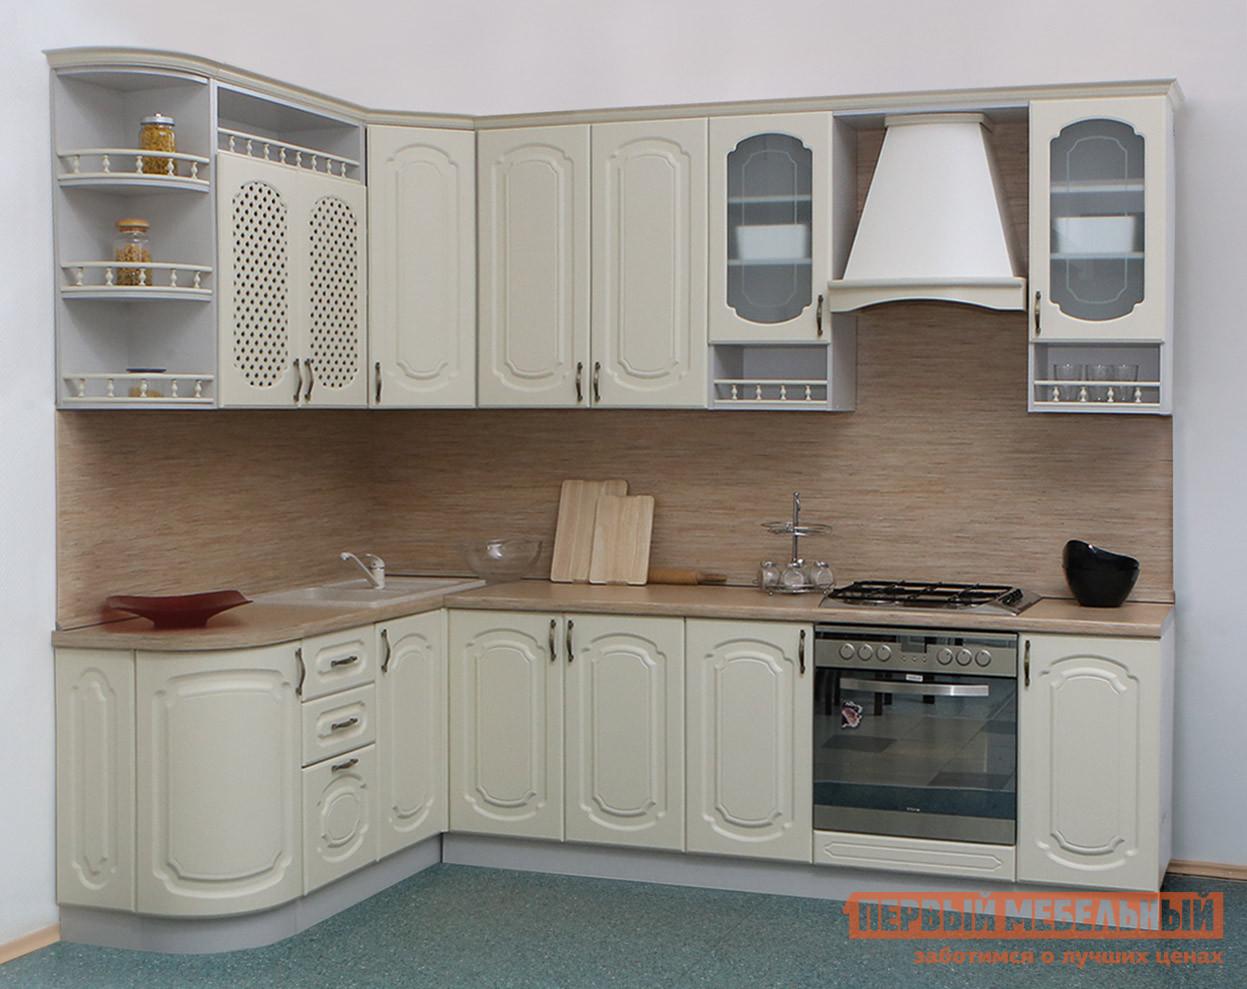 Кухонный гарнитур Боровичи Классика Прованс угловой 1735х2200 кухонный гарнитур трия фэнтези 120 см